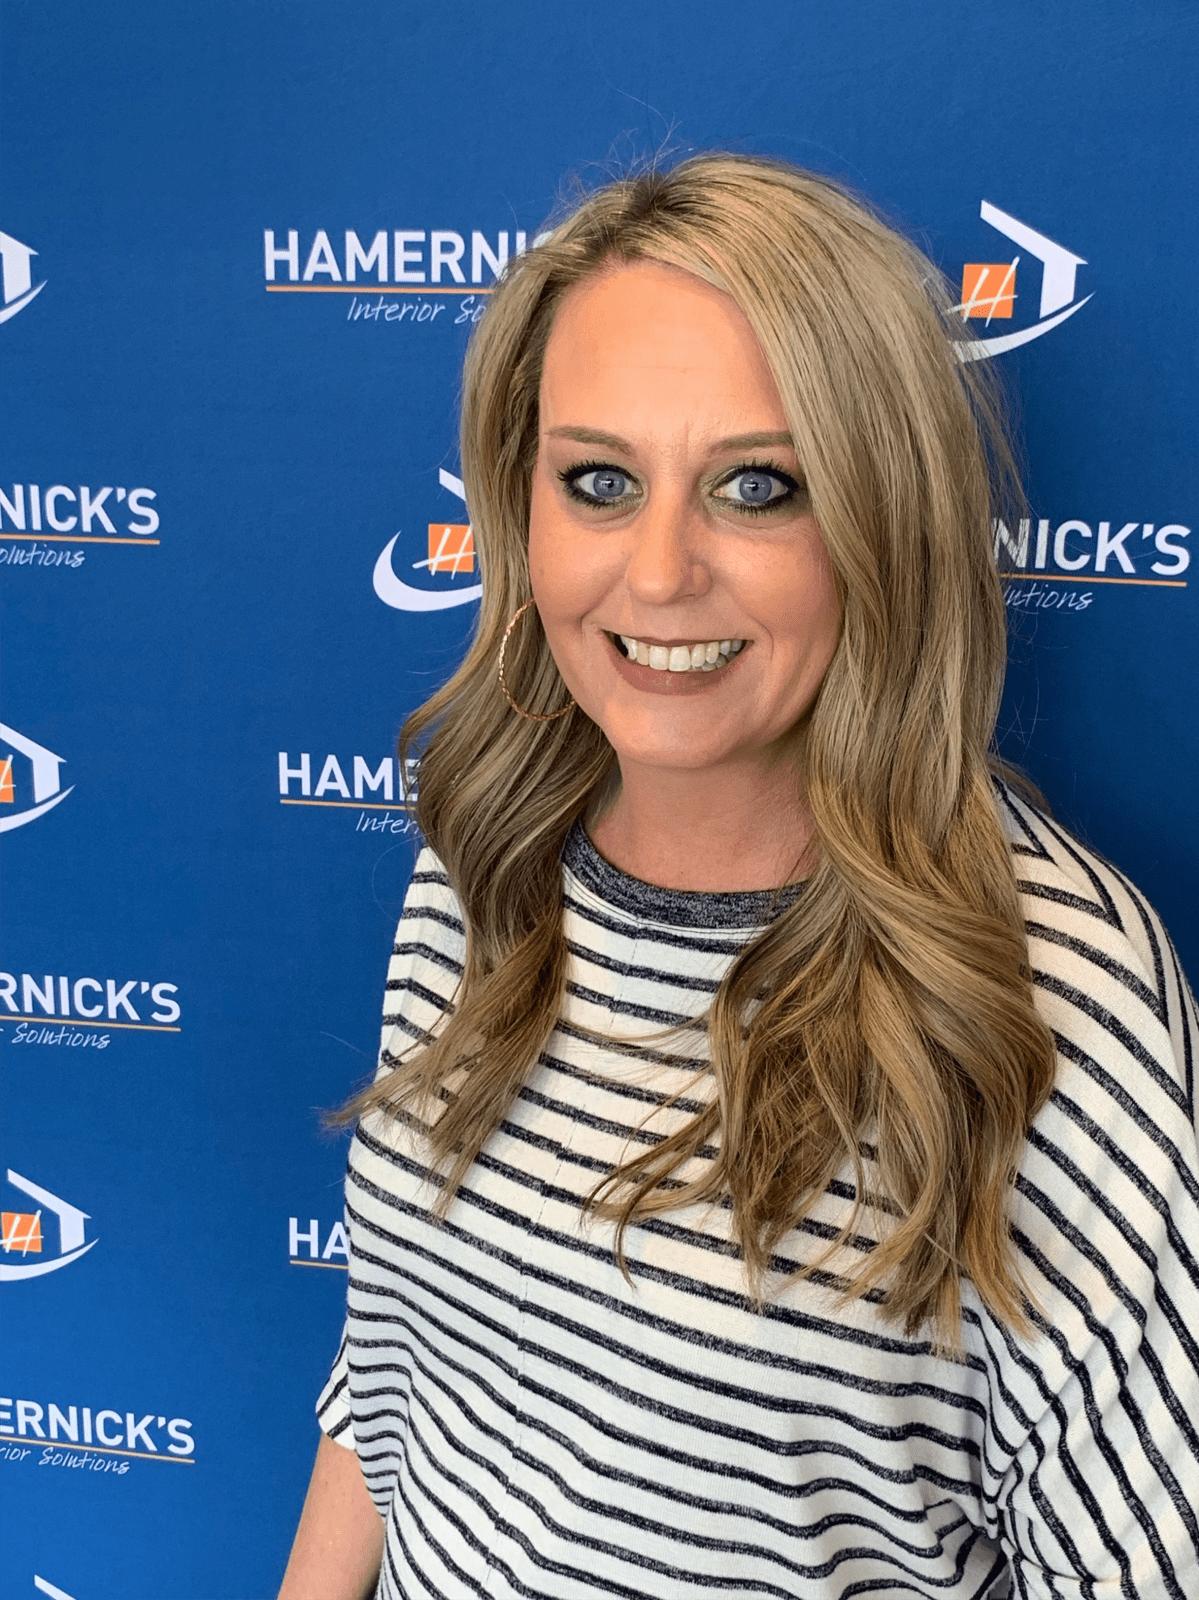 Danielle | Hamernick's Interior Solutions